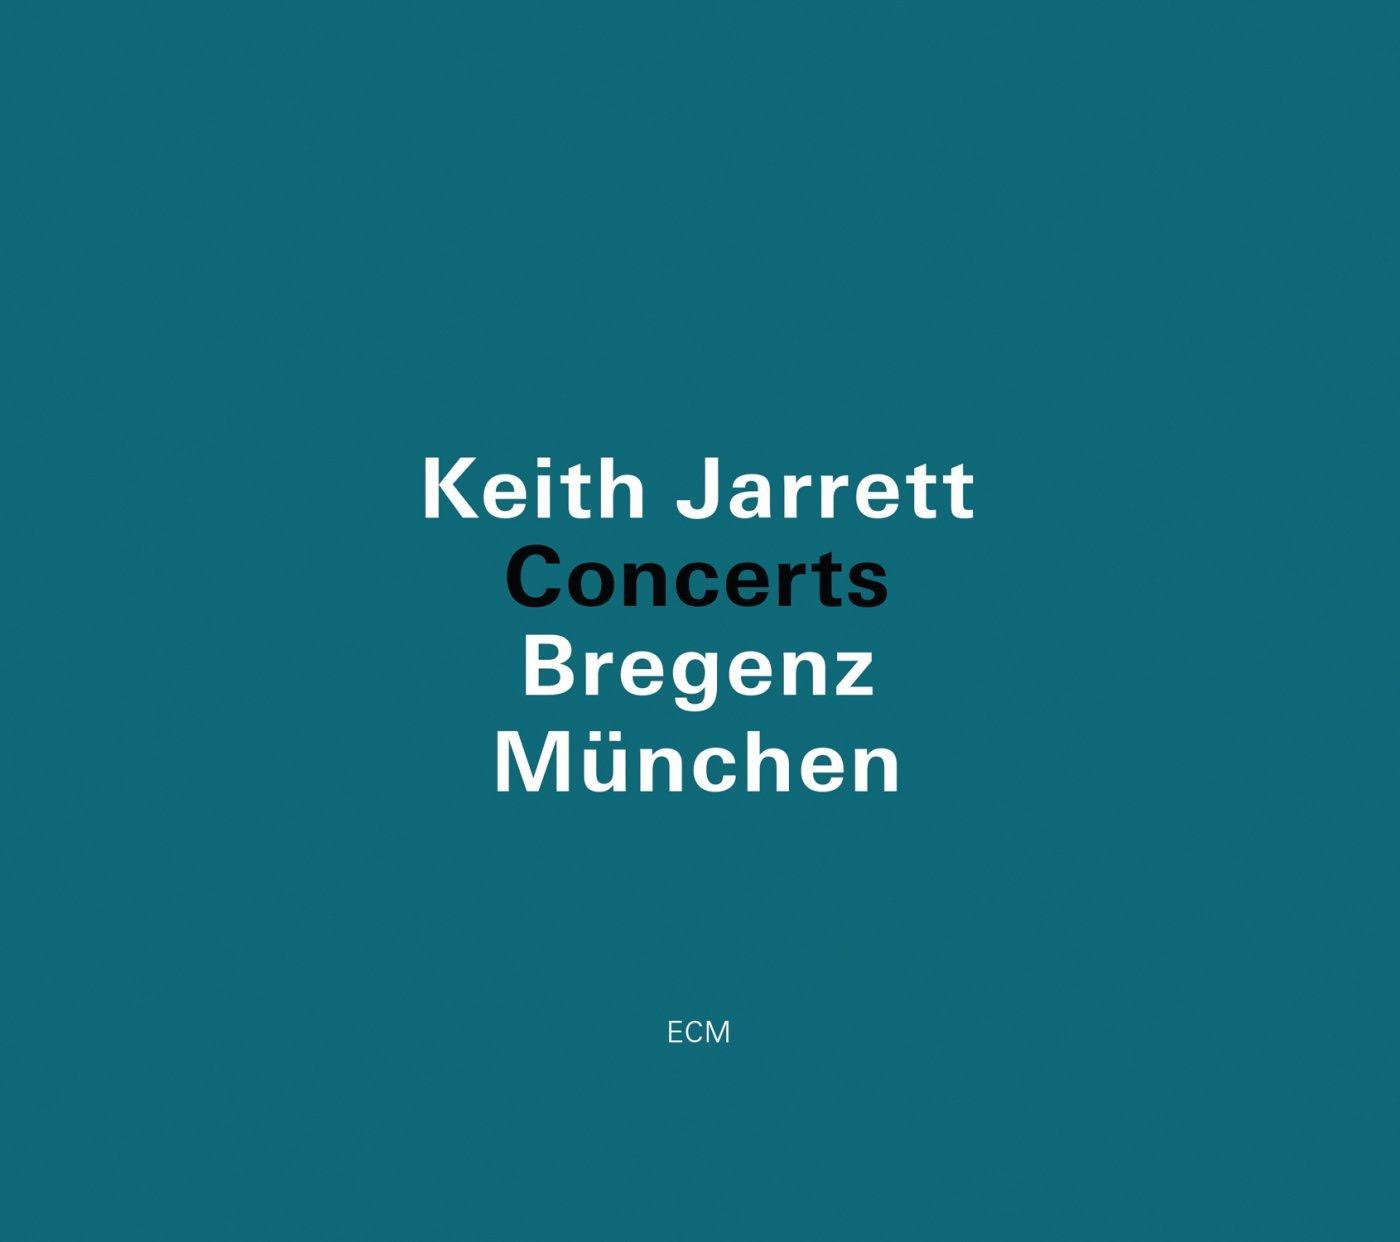 Keith Jarrett - Concerts: Bregenz Munich cover